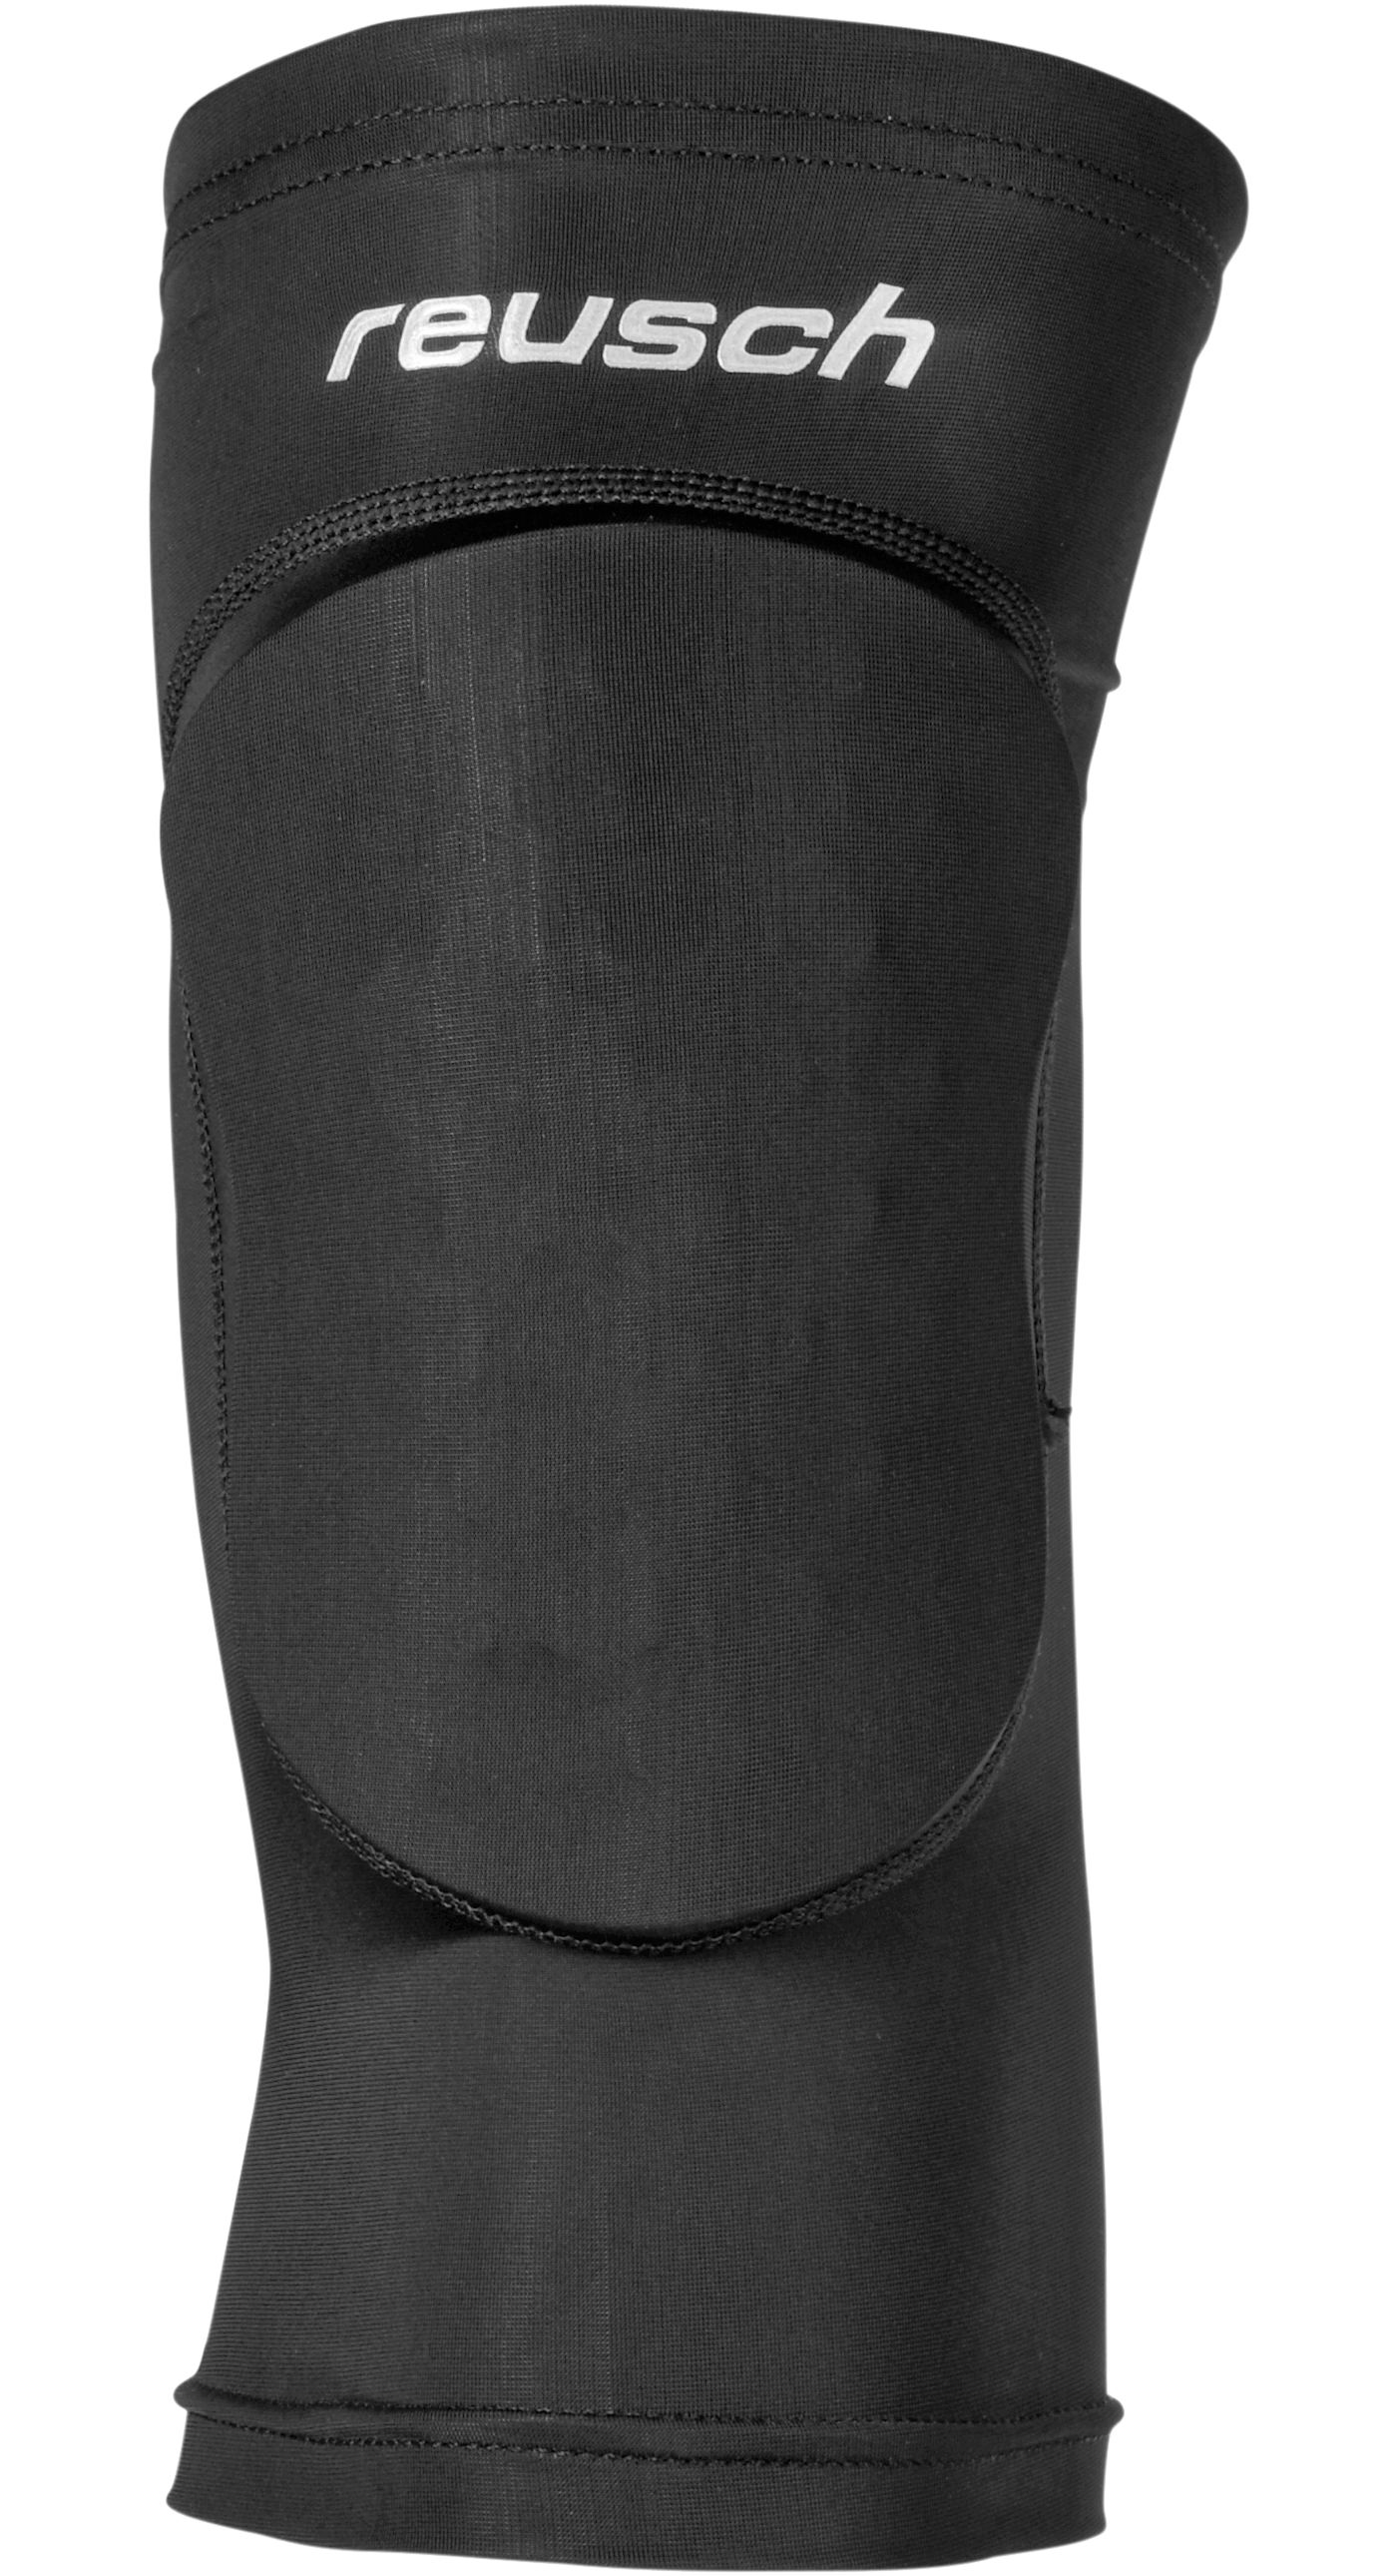 Reusch Knee Protector Soccer Sleeve